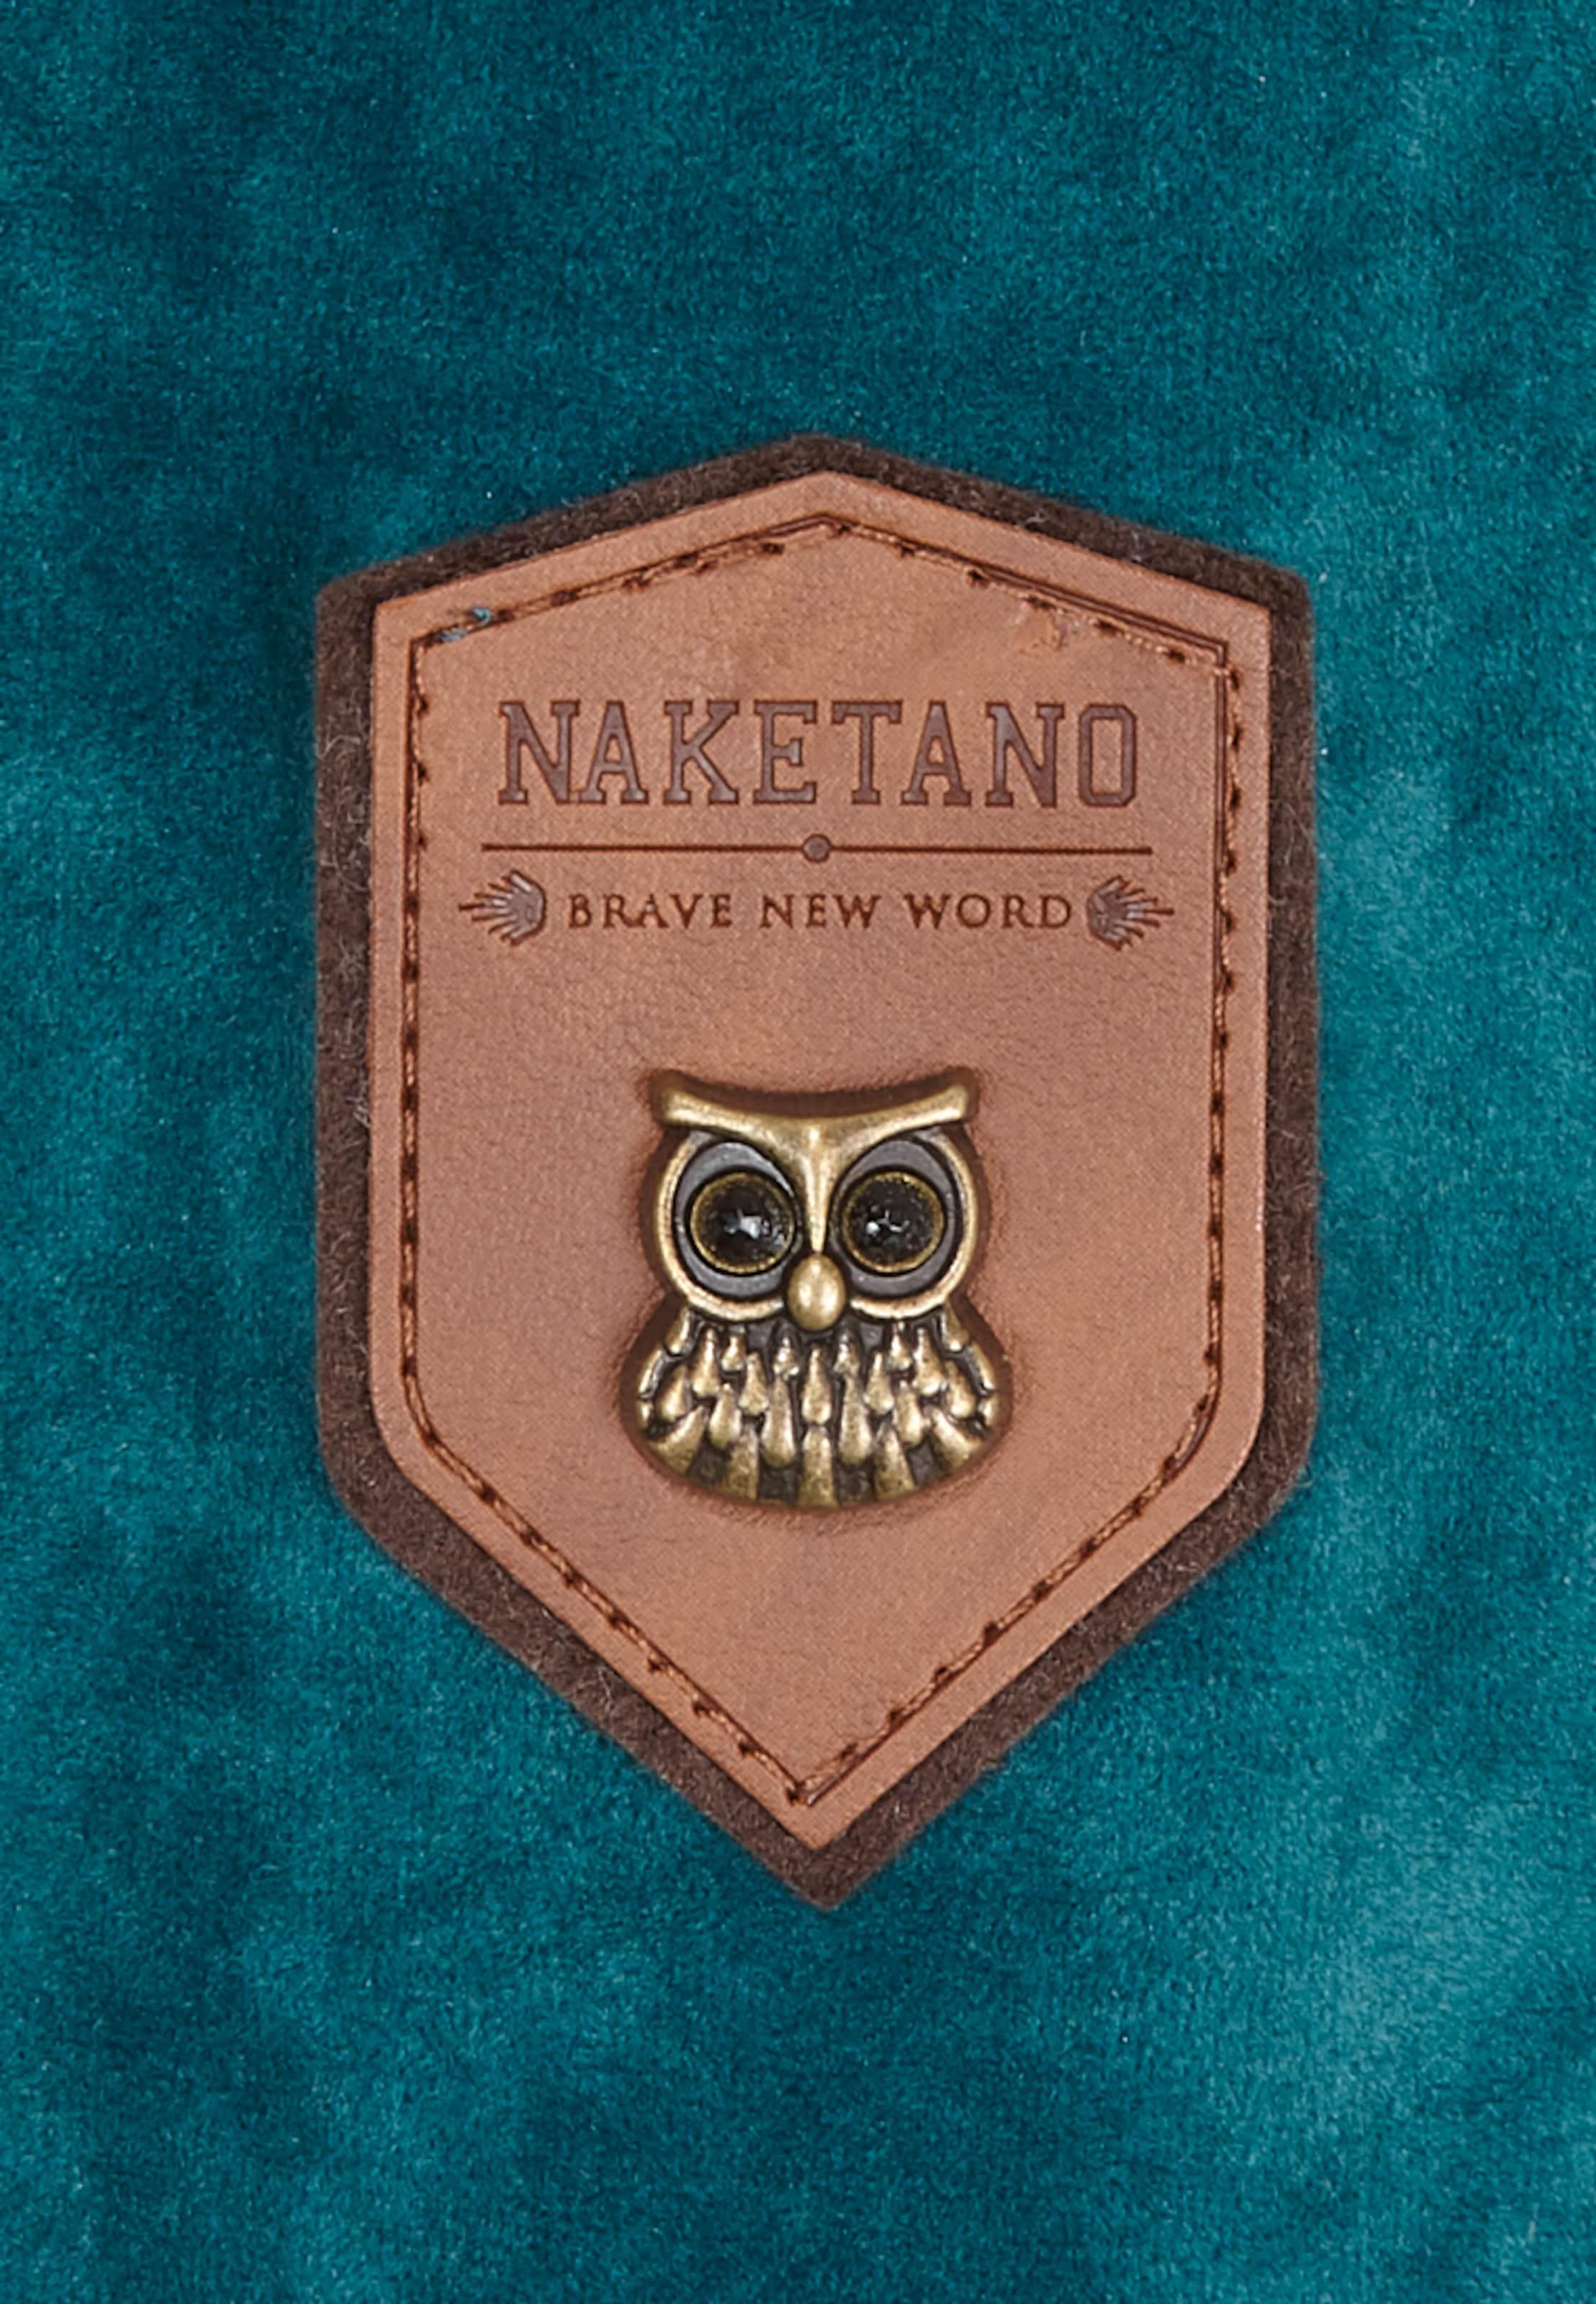 Petrol Petrol Naketano Naketano In Sweatshirt Naketano In Naketano Sweatshirt In Sweatshirt Sweatshirt Petrol In bfyY76g